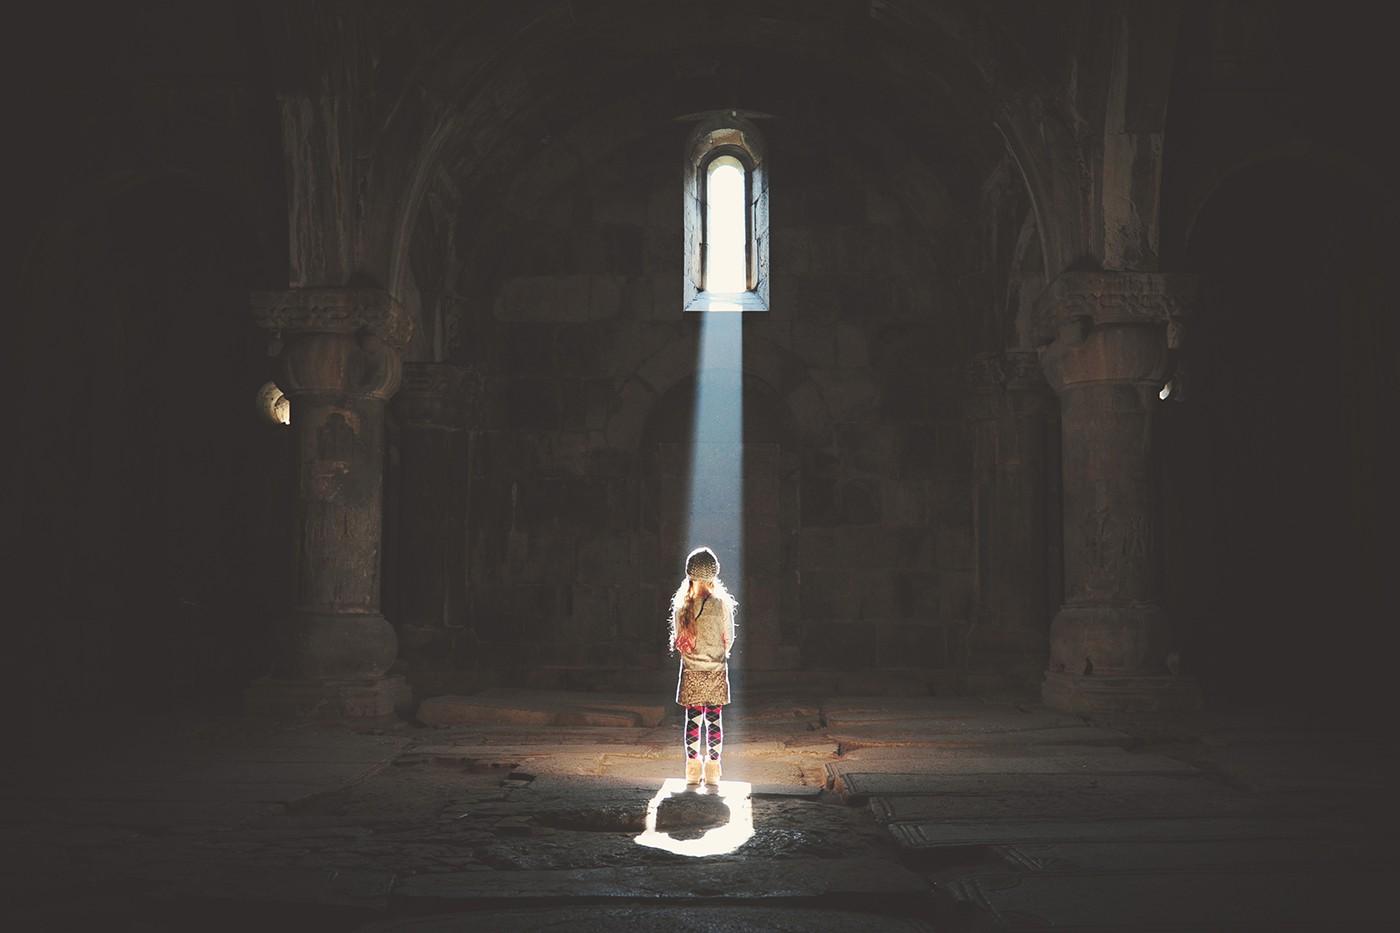 Church Light, Armenia by Kirsty Larmour